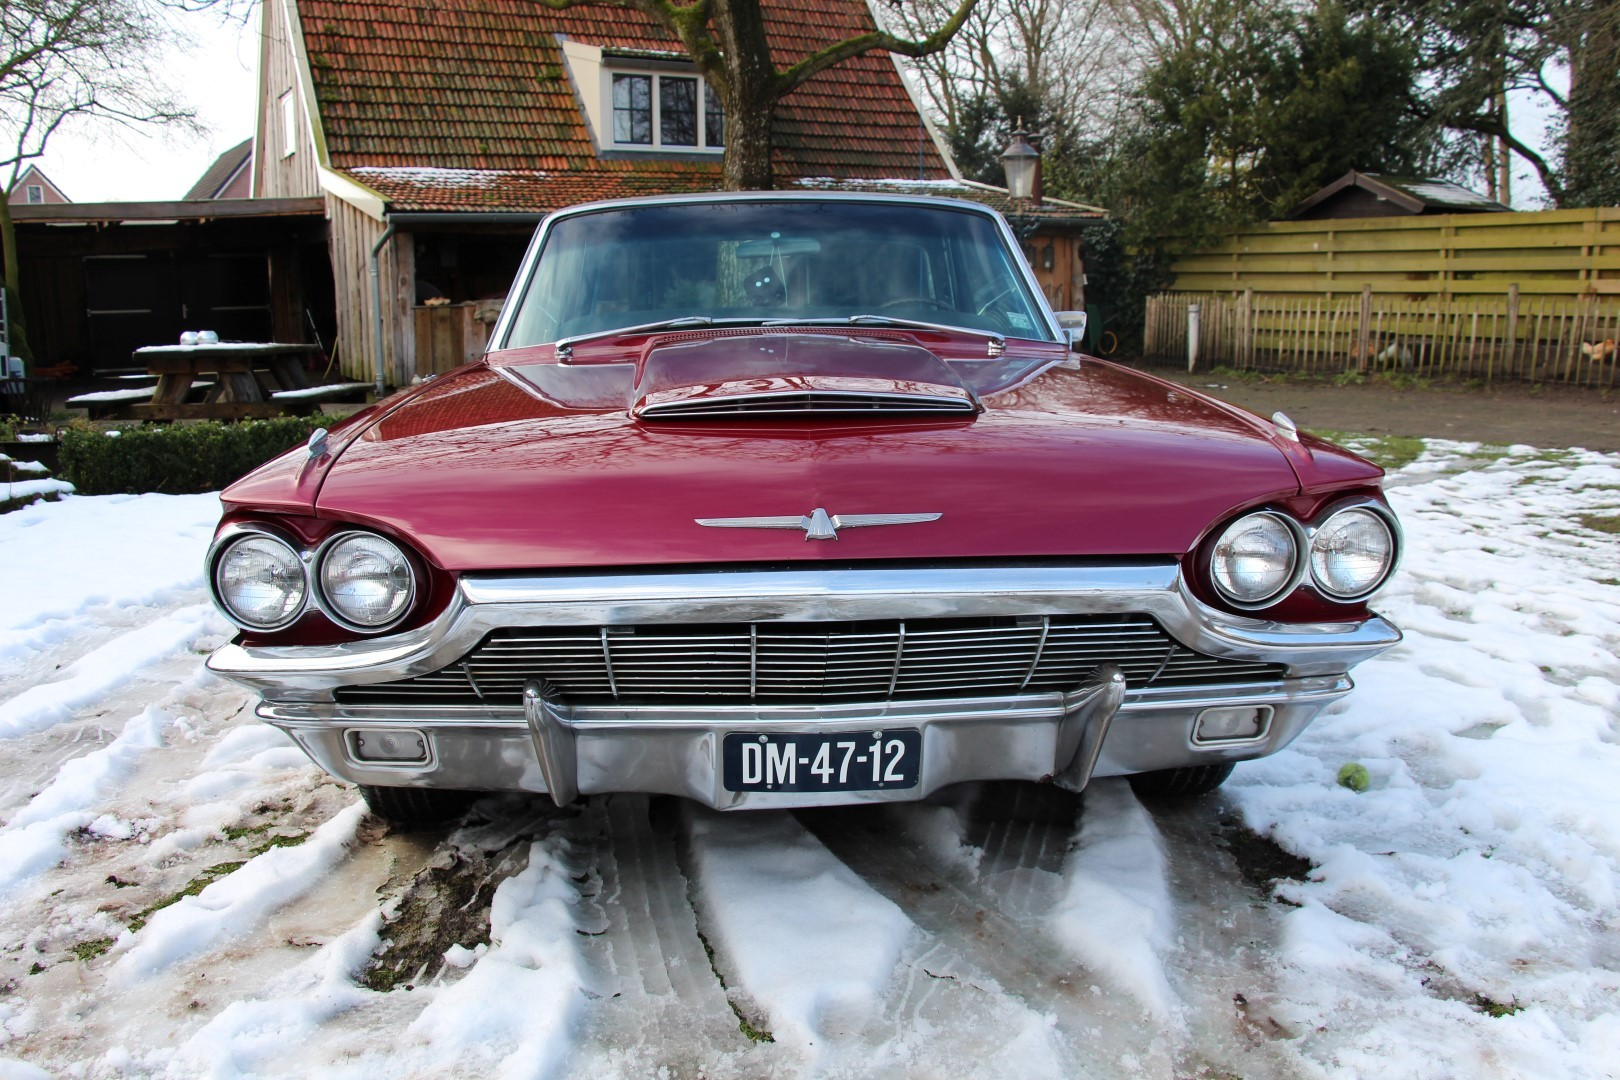 1965 Ford Thunderbird Hardtop - Burgundy new (15)